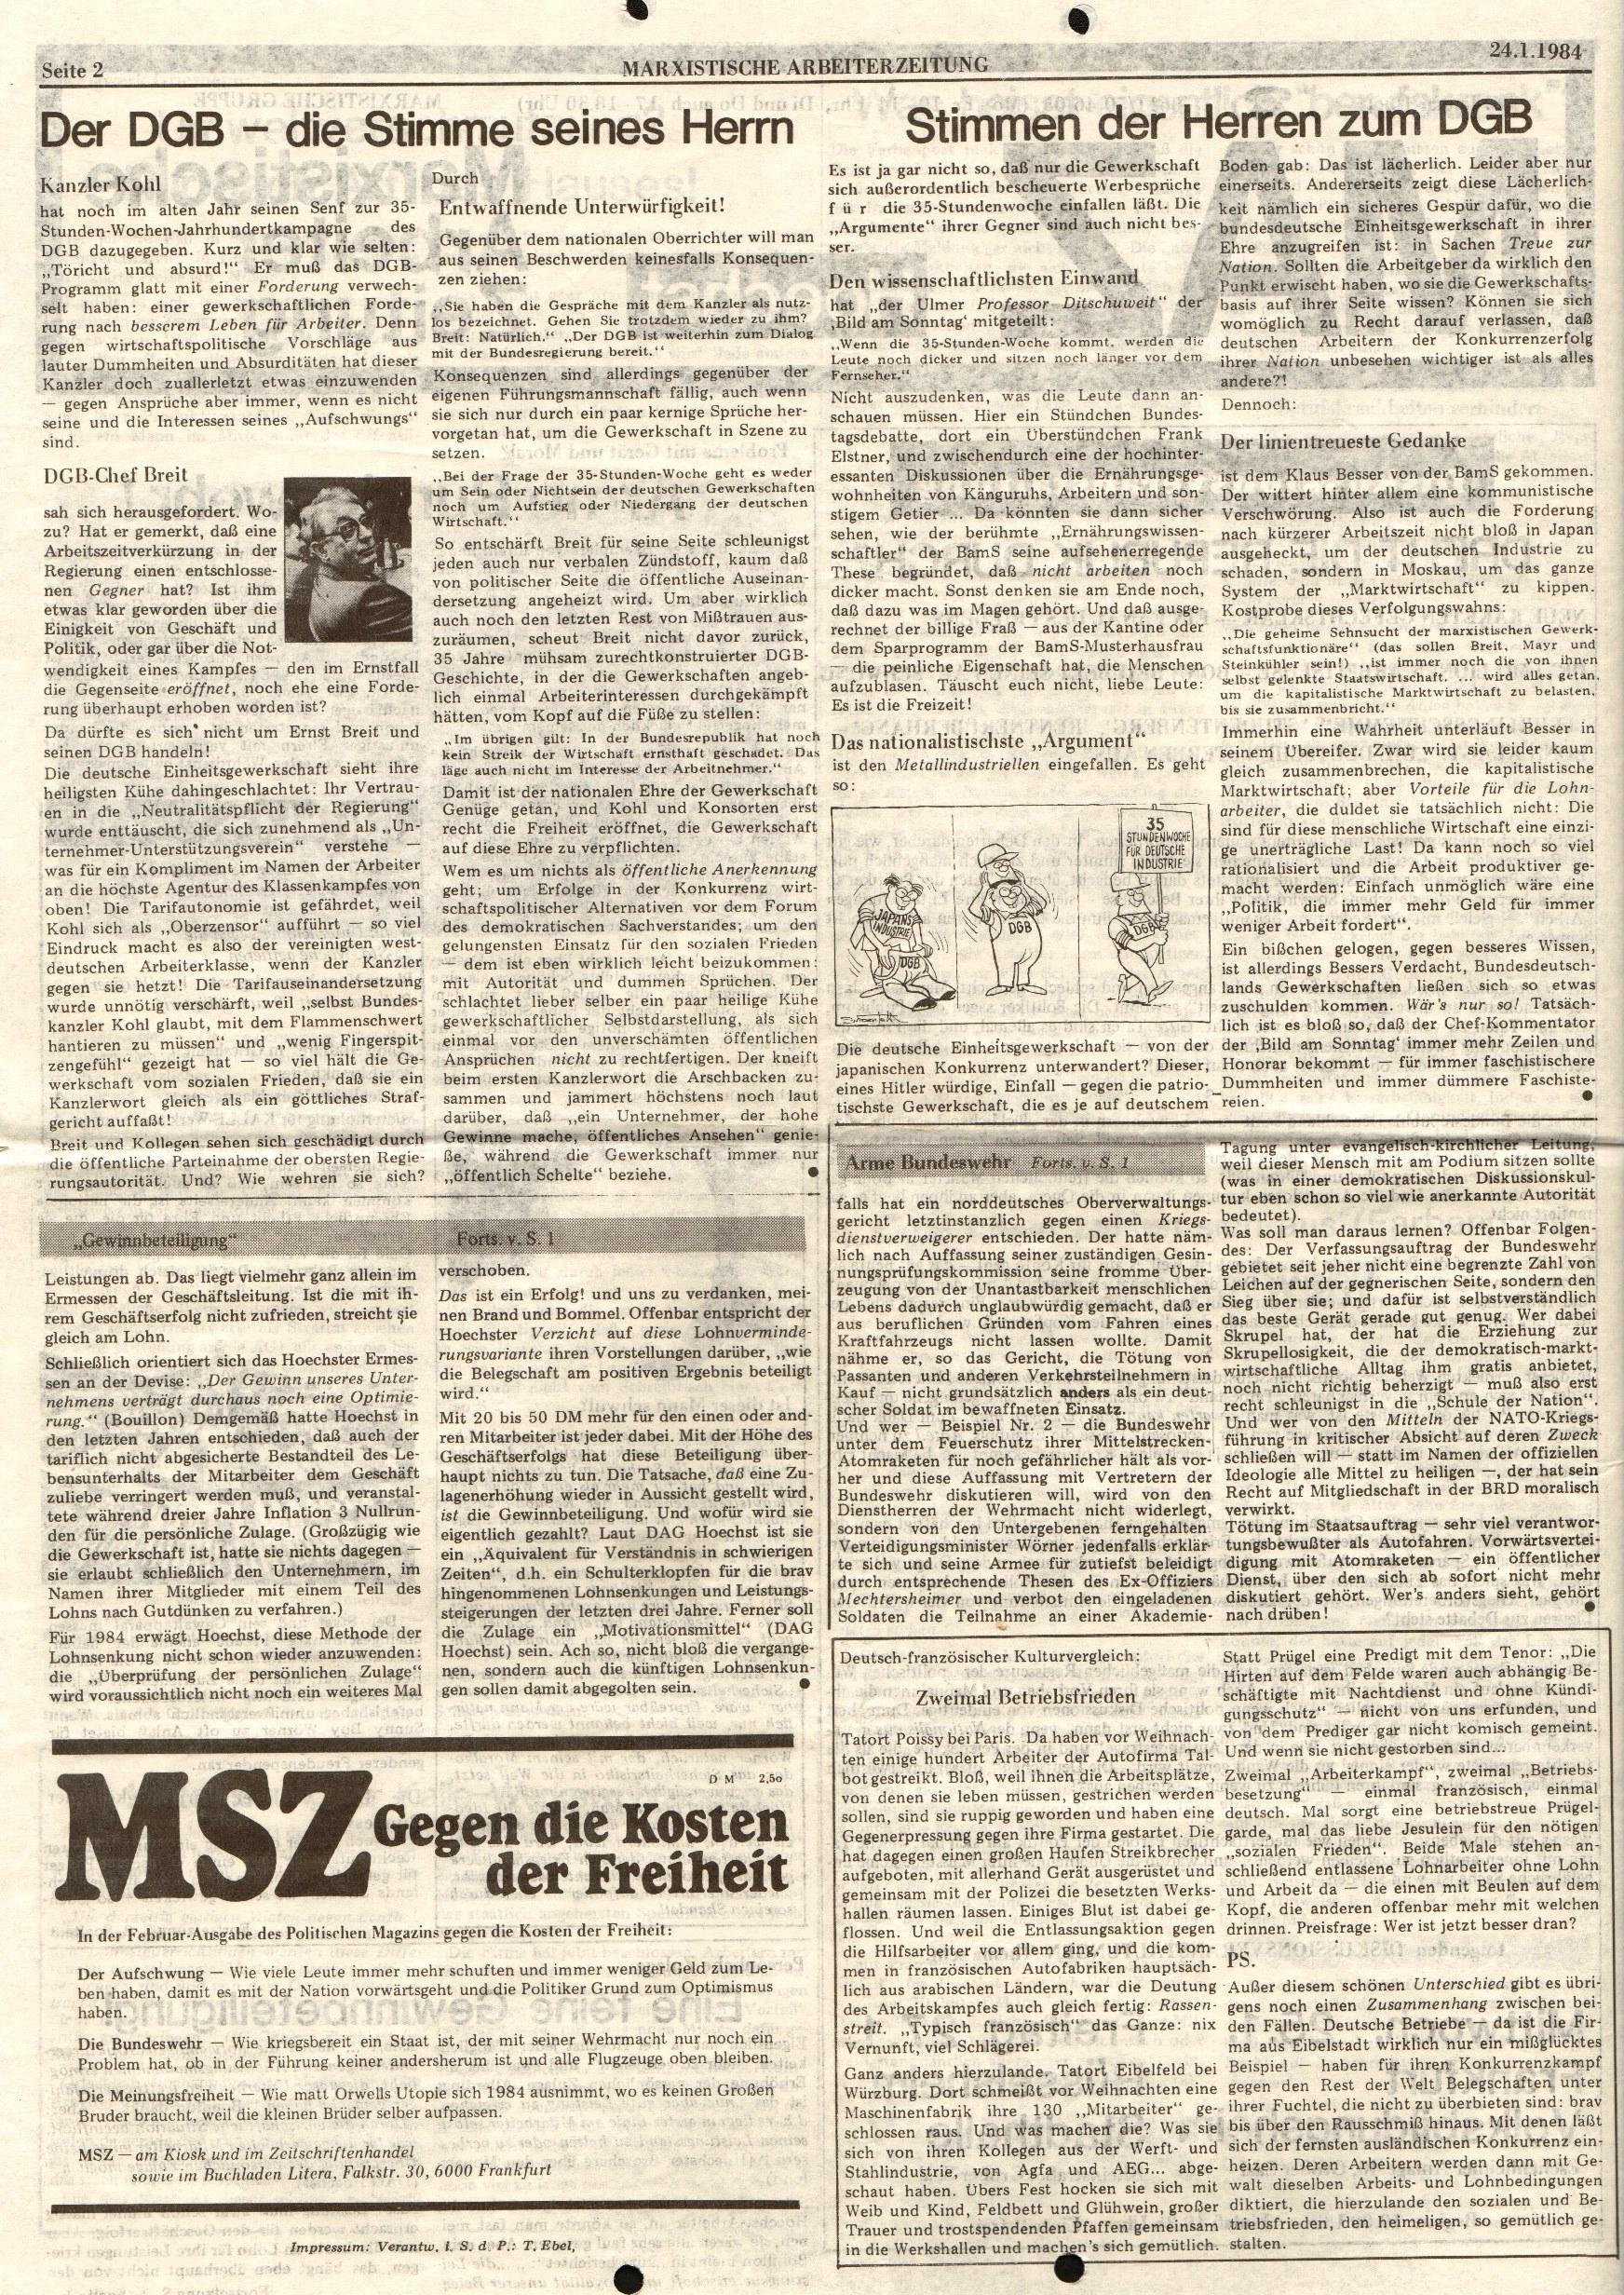 Frankfurt_CPK_Hoechst_MAZ214